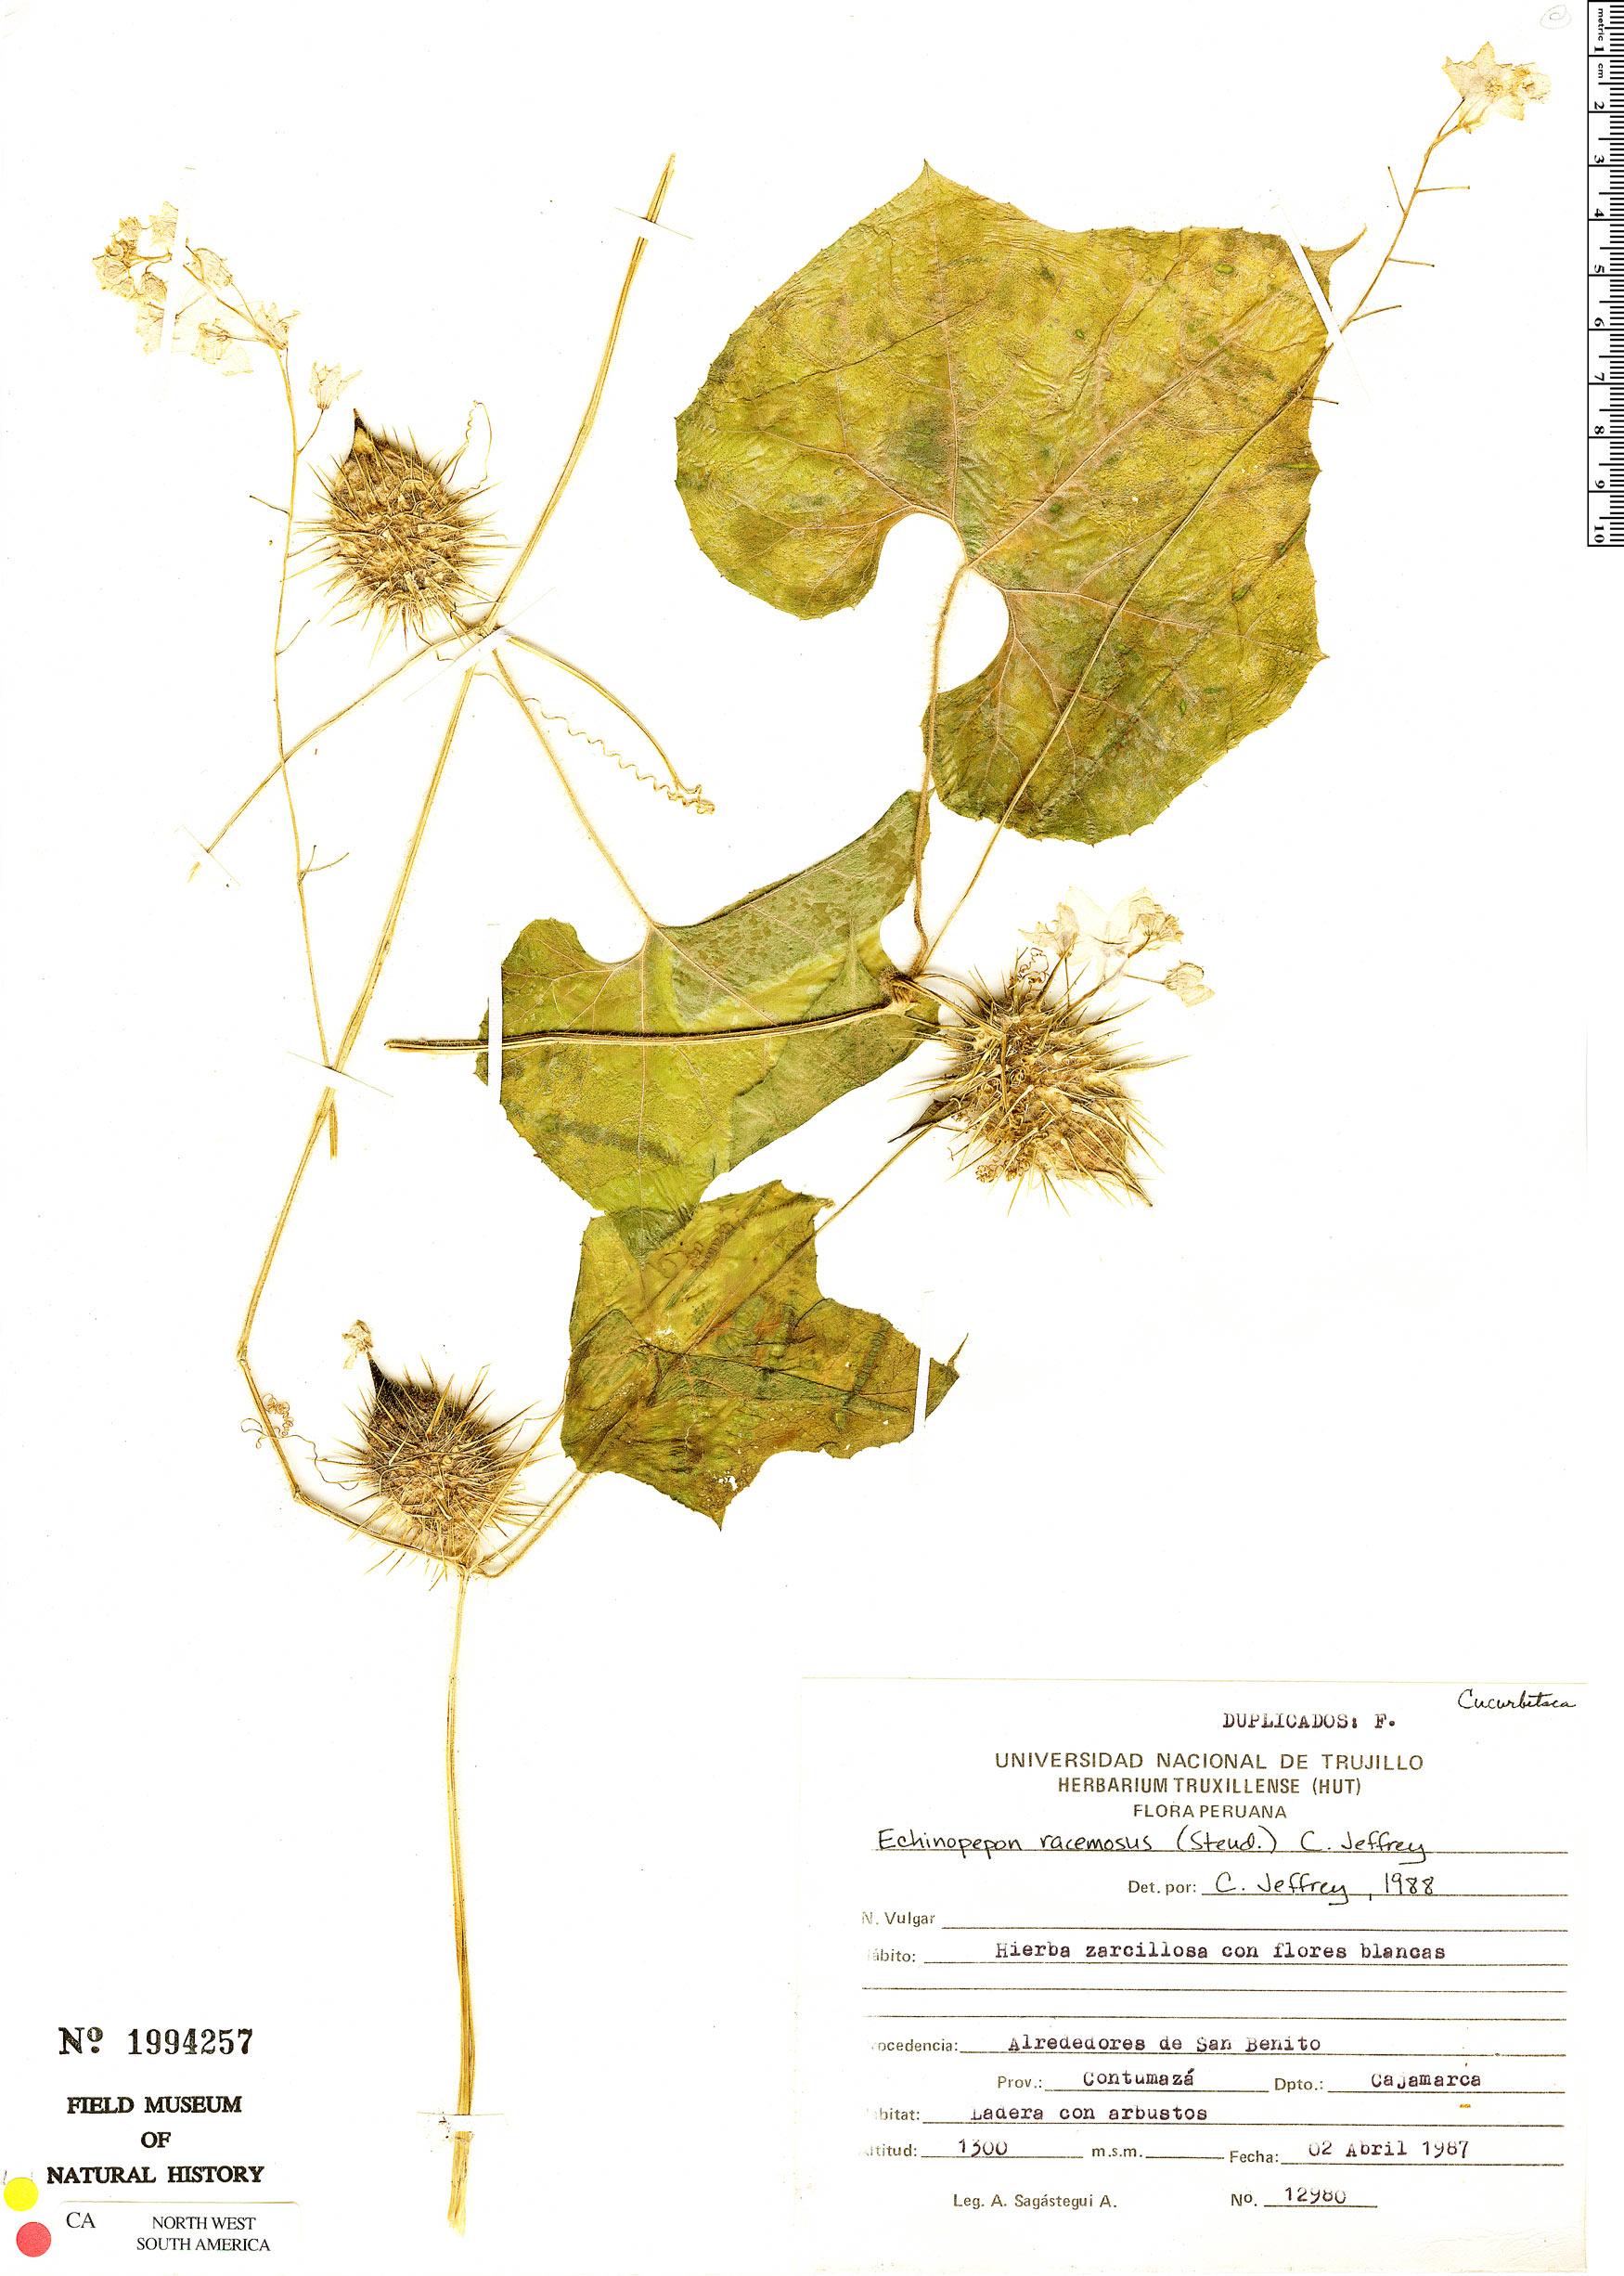 Specimen: Echinopepon racemosus